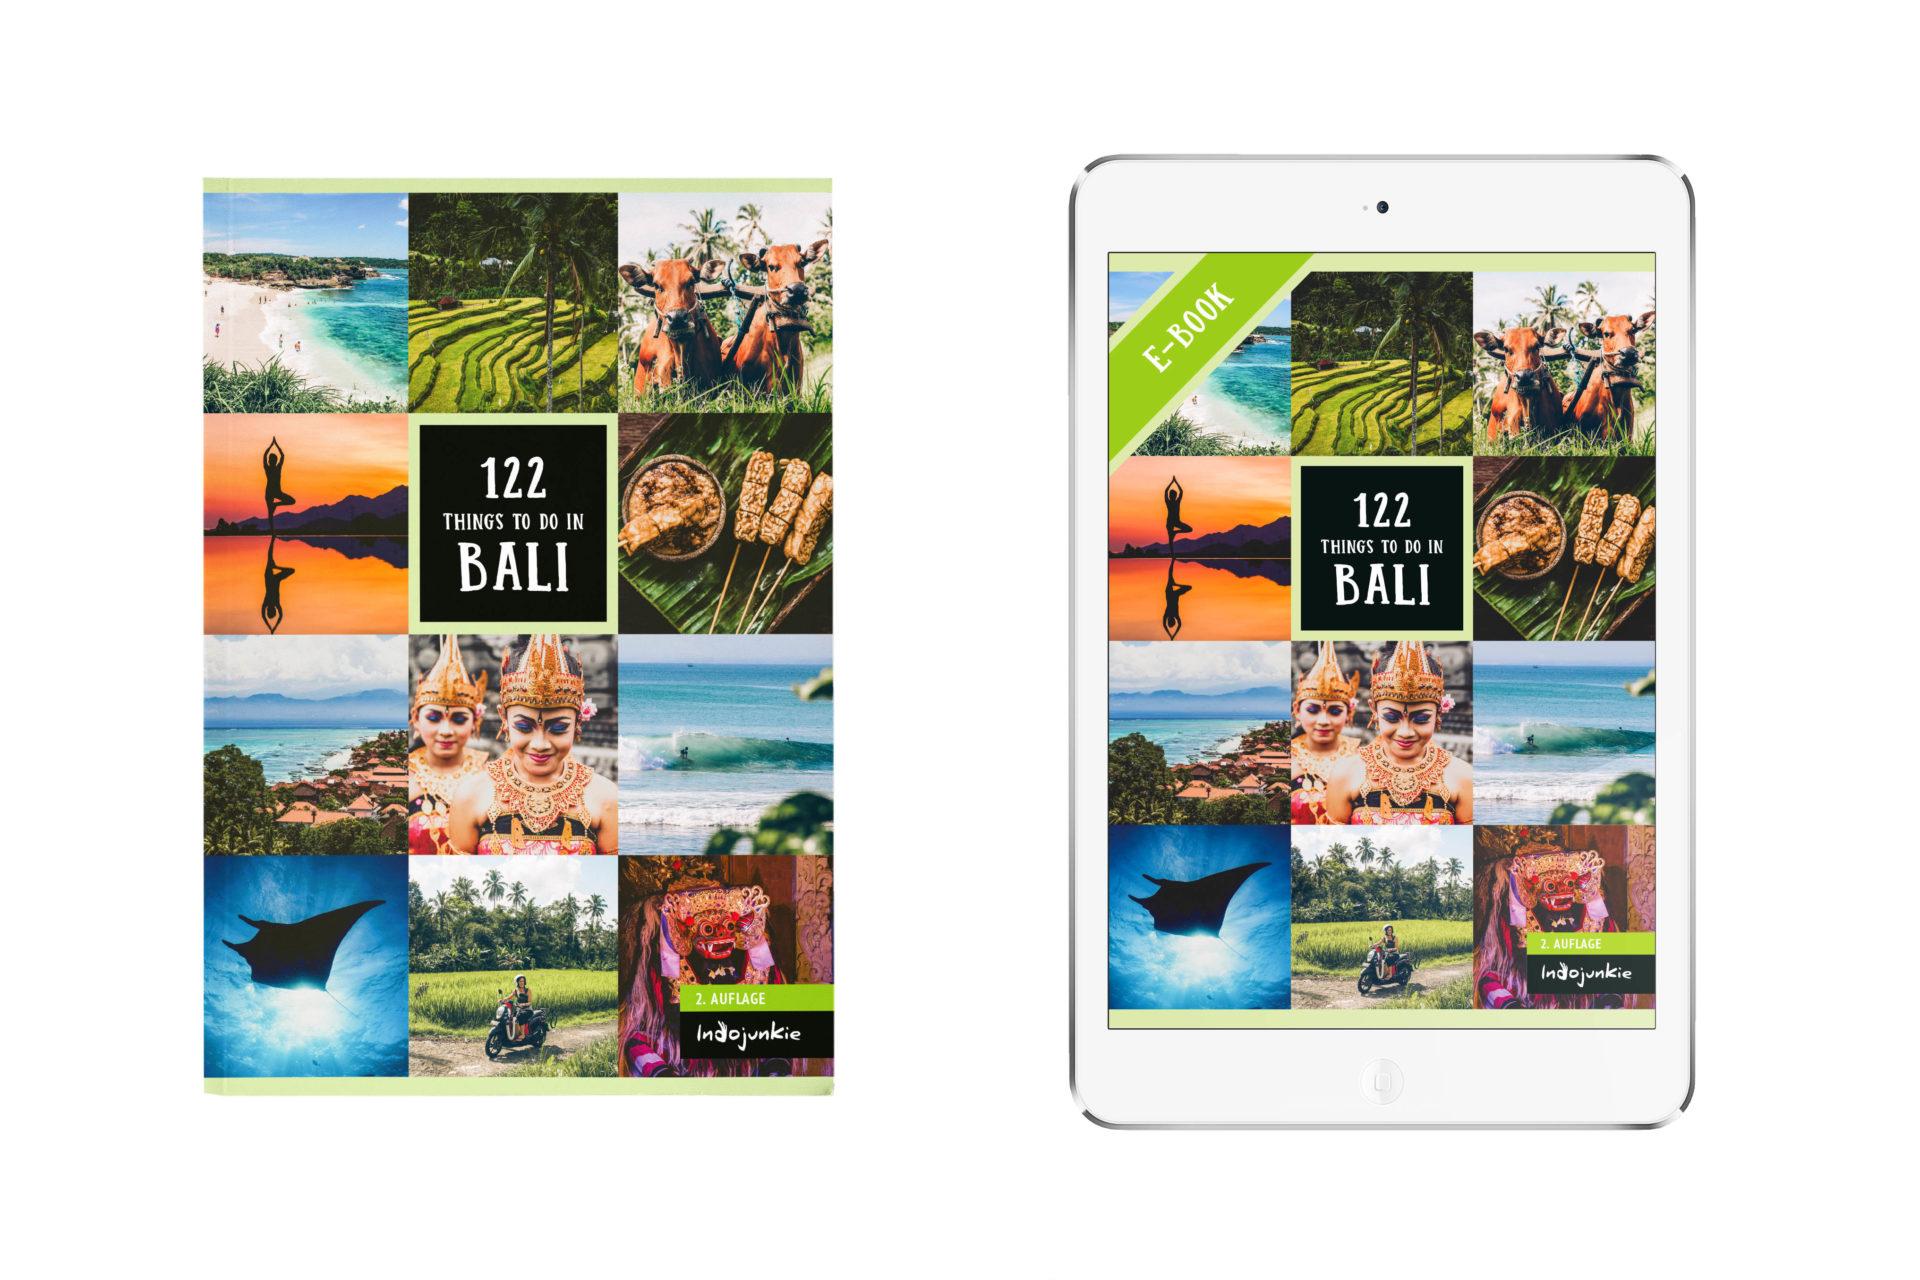 bali-reisefuehrer-cover